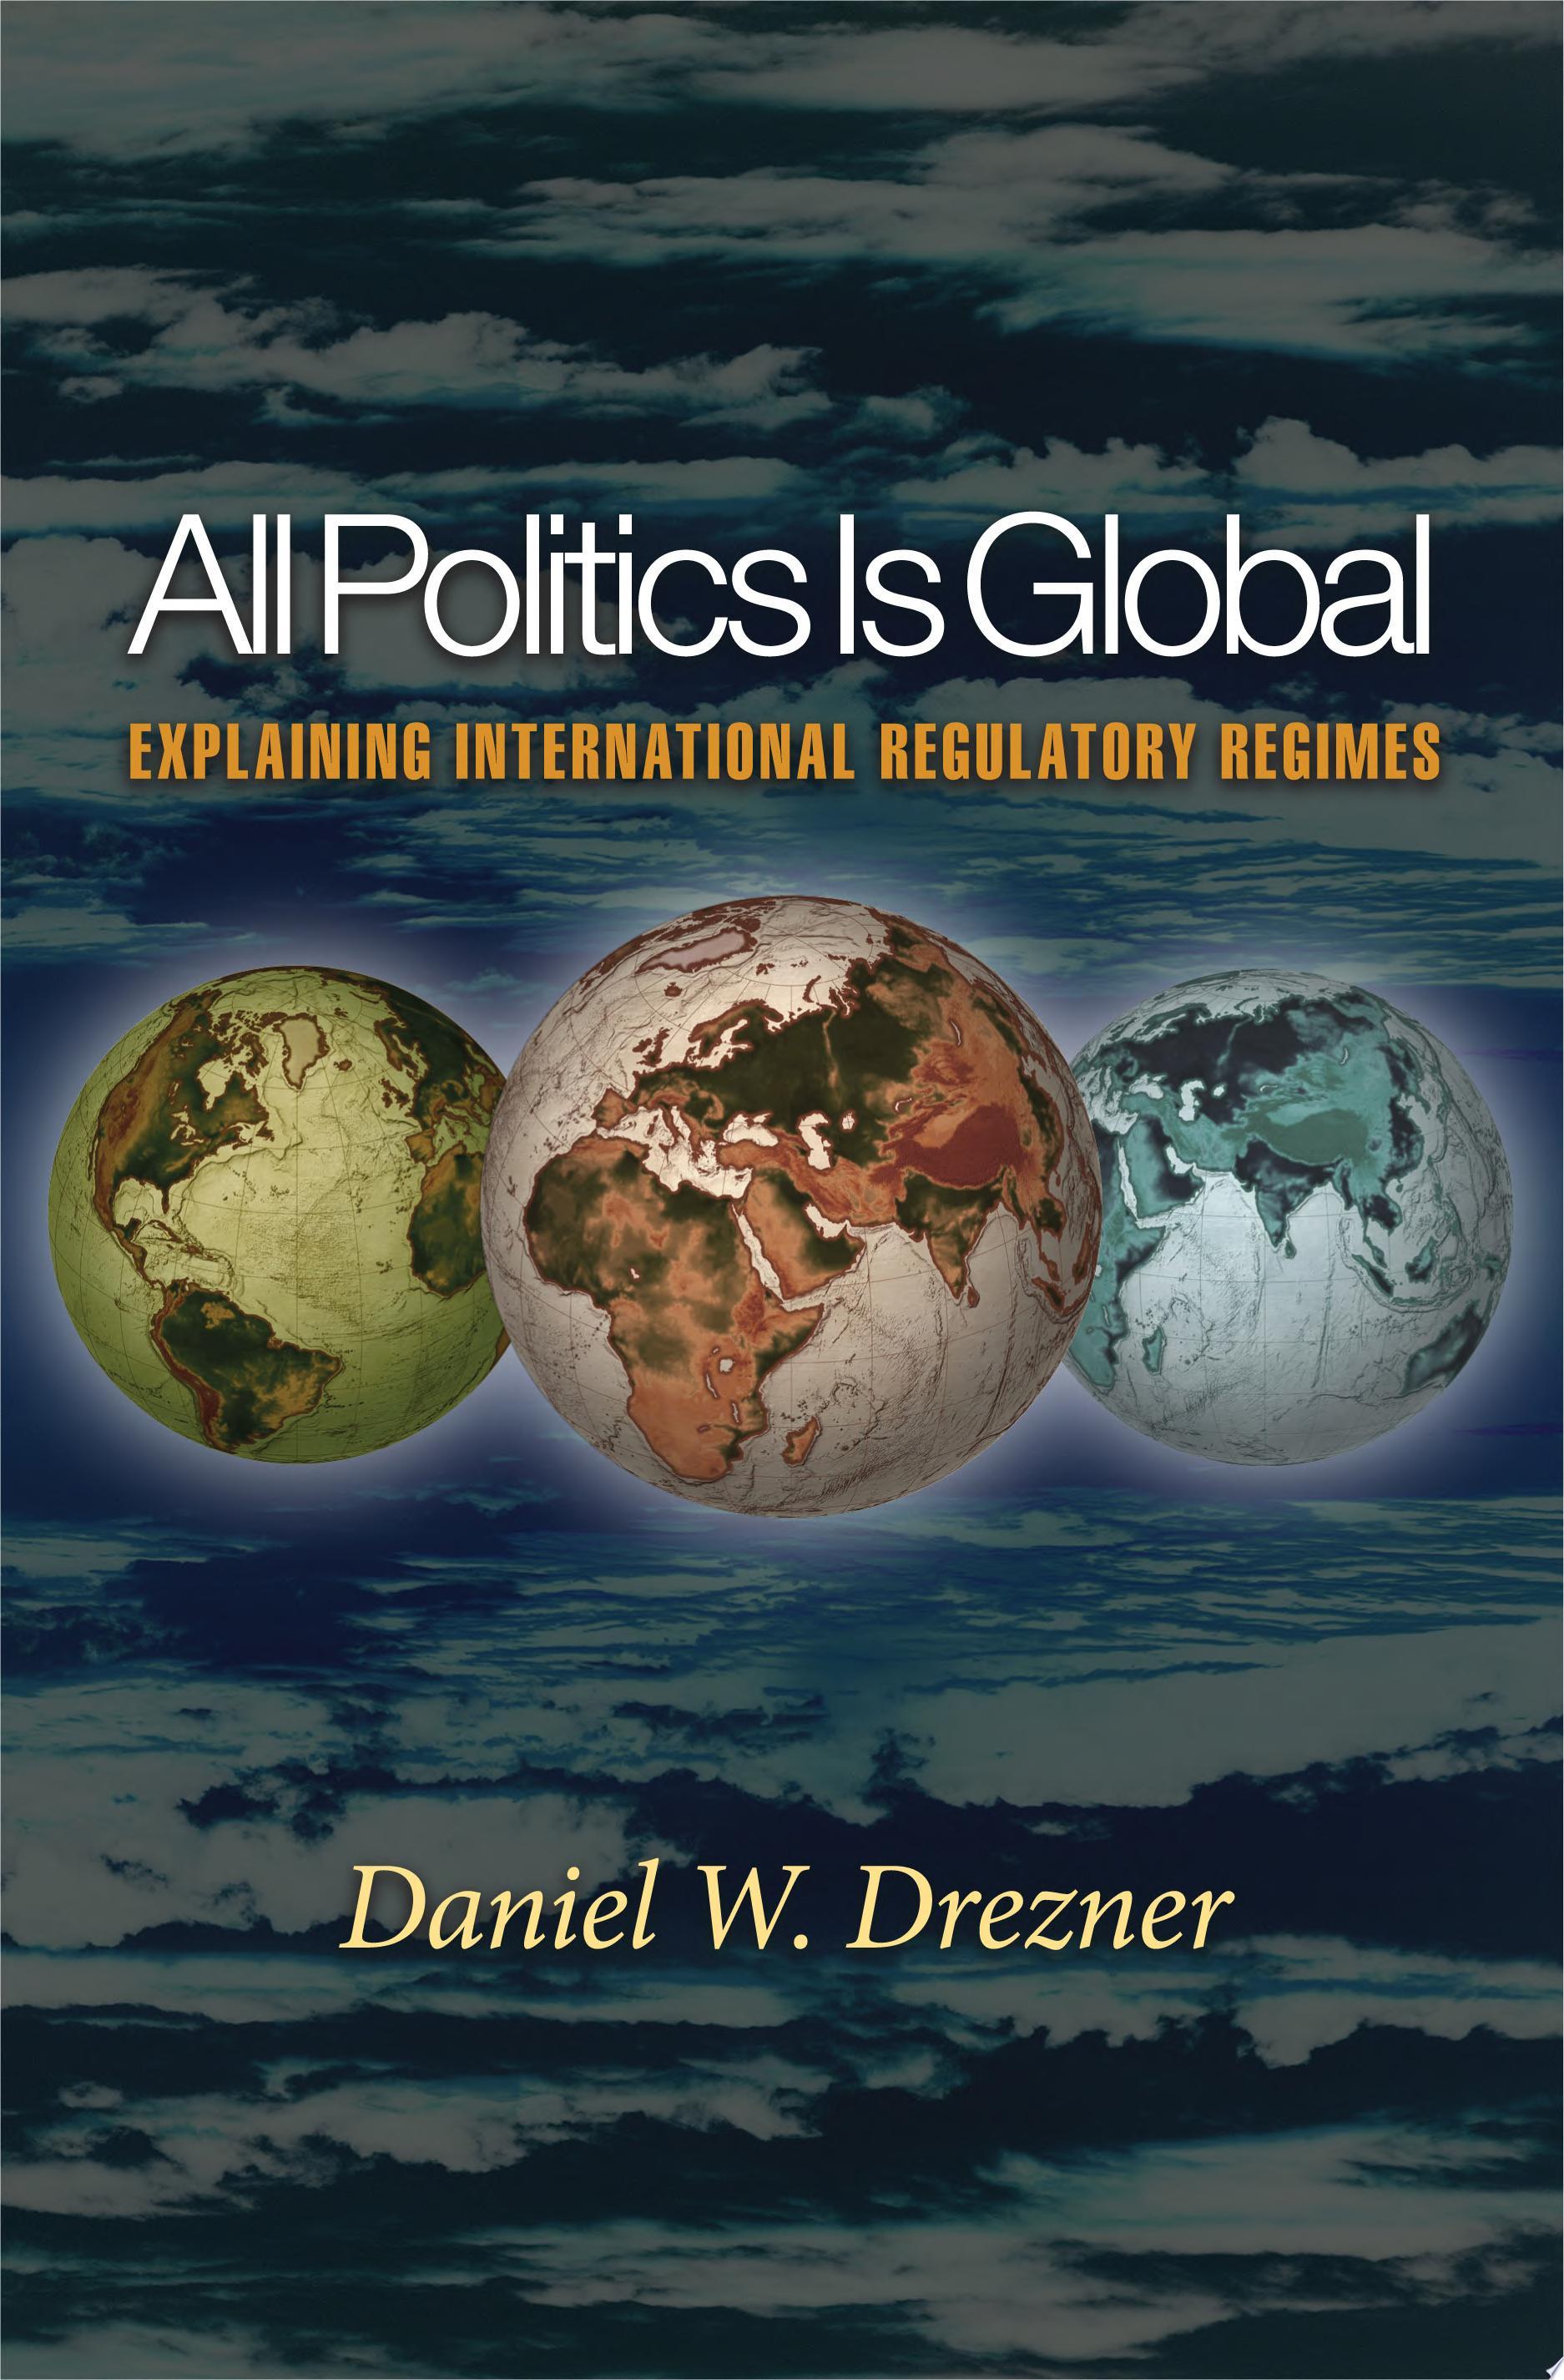 All Politics Is Global